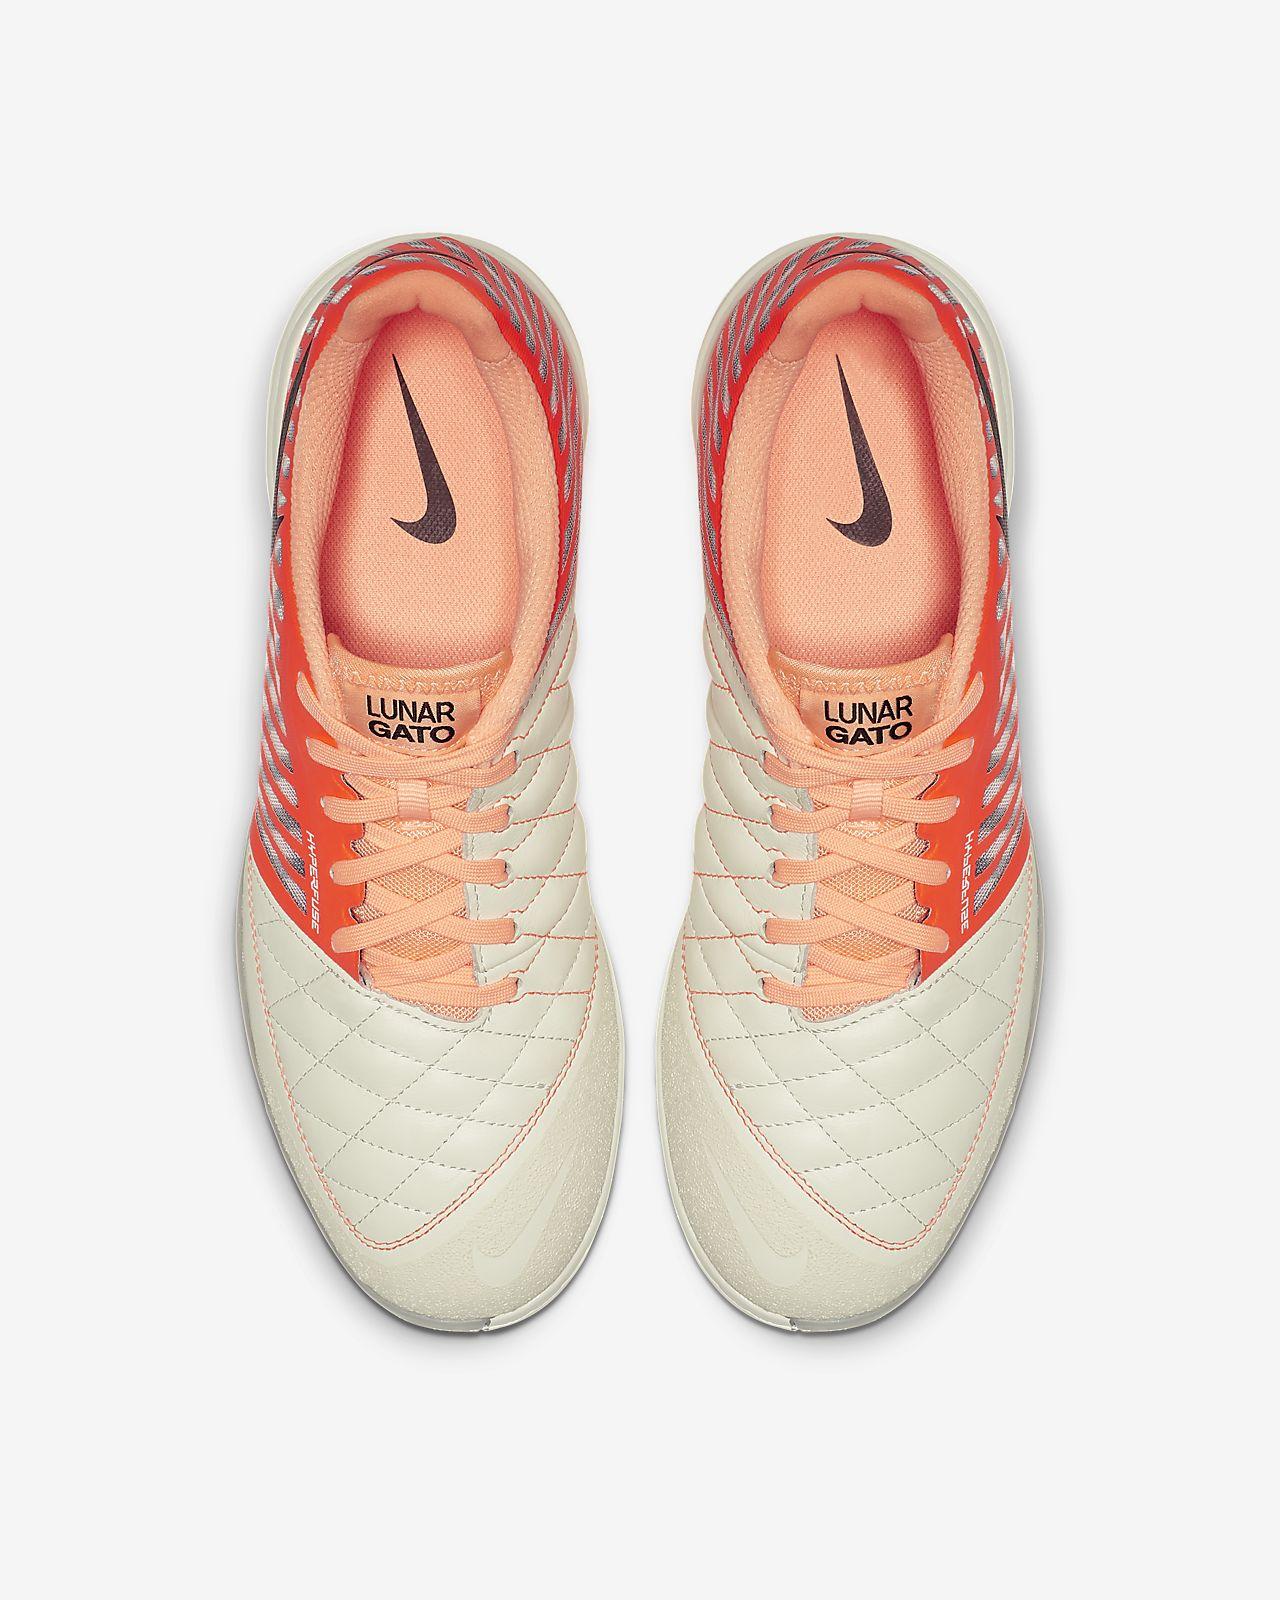 NIKE Tiempo Lunar Legend 7 Pro TF 'BlackBlack�?  UNBOXING & ON FEET   football shoes   2018